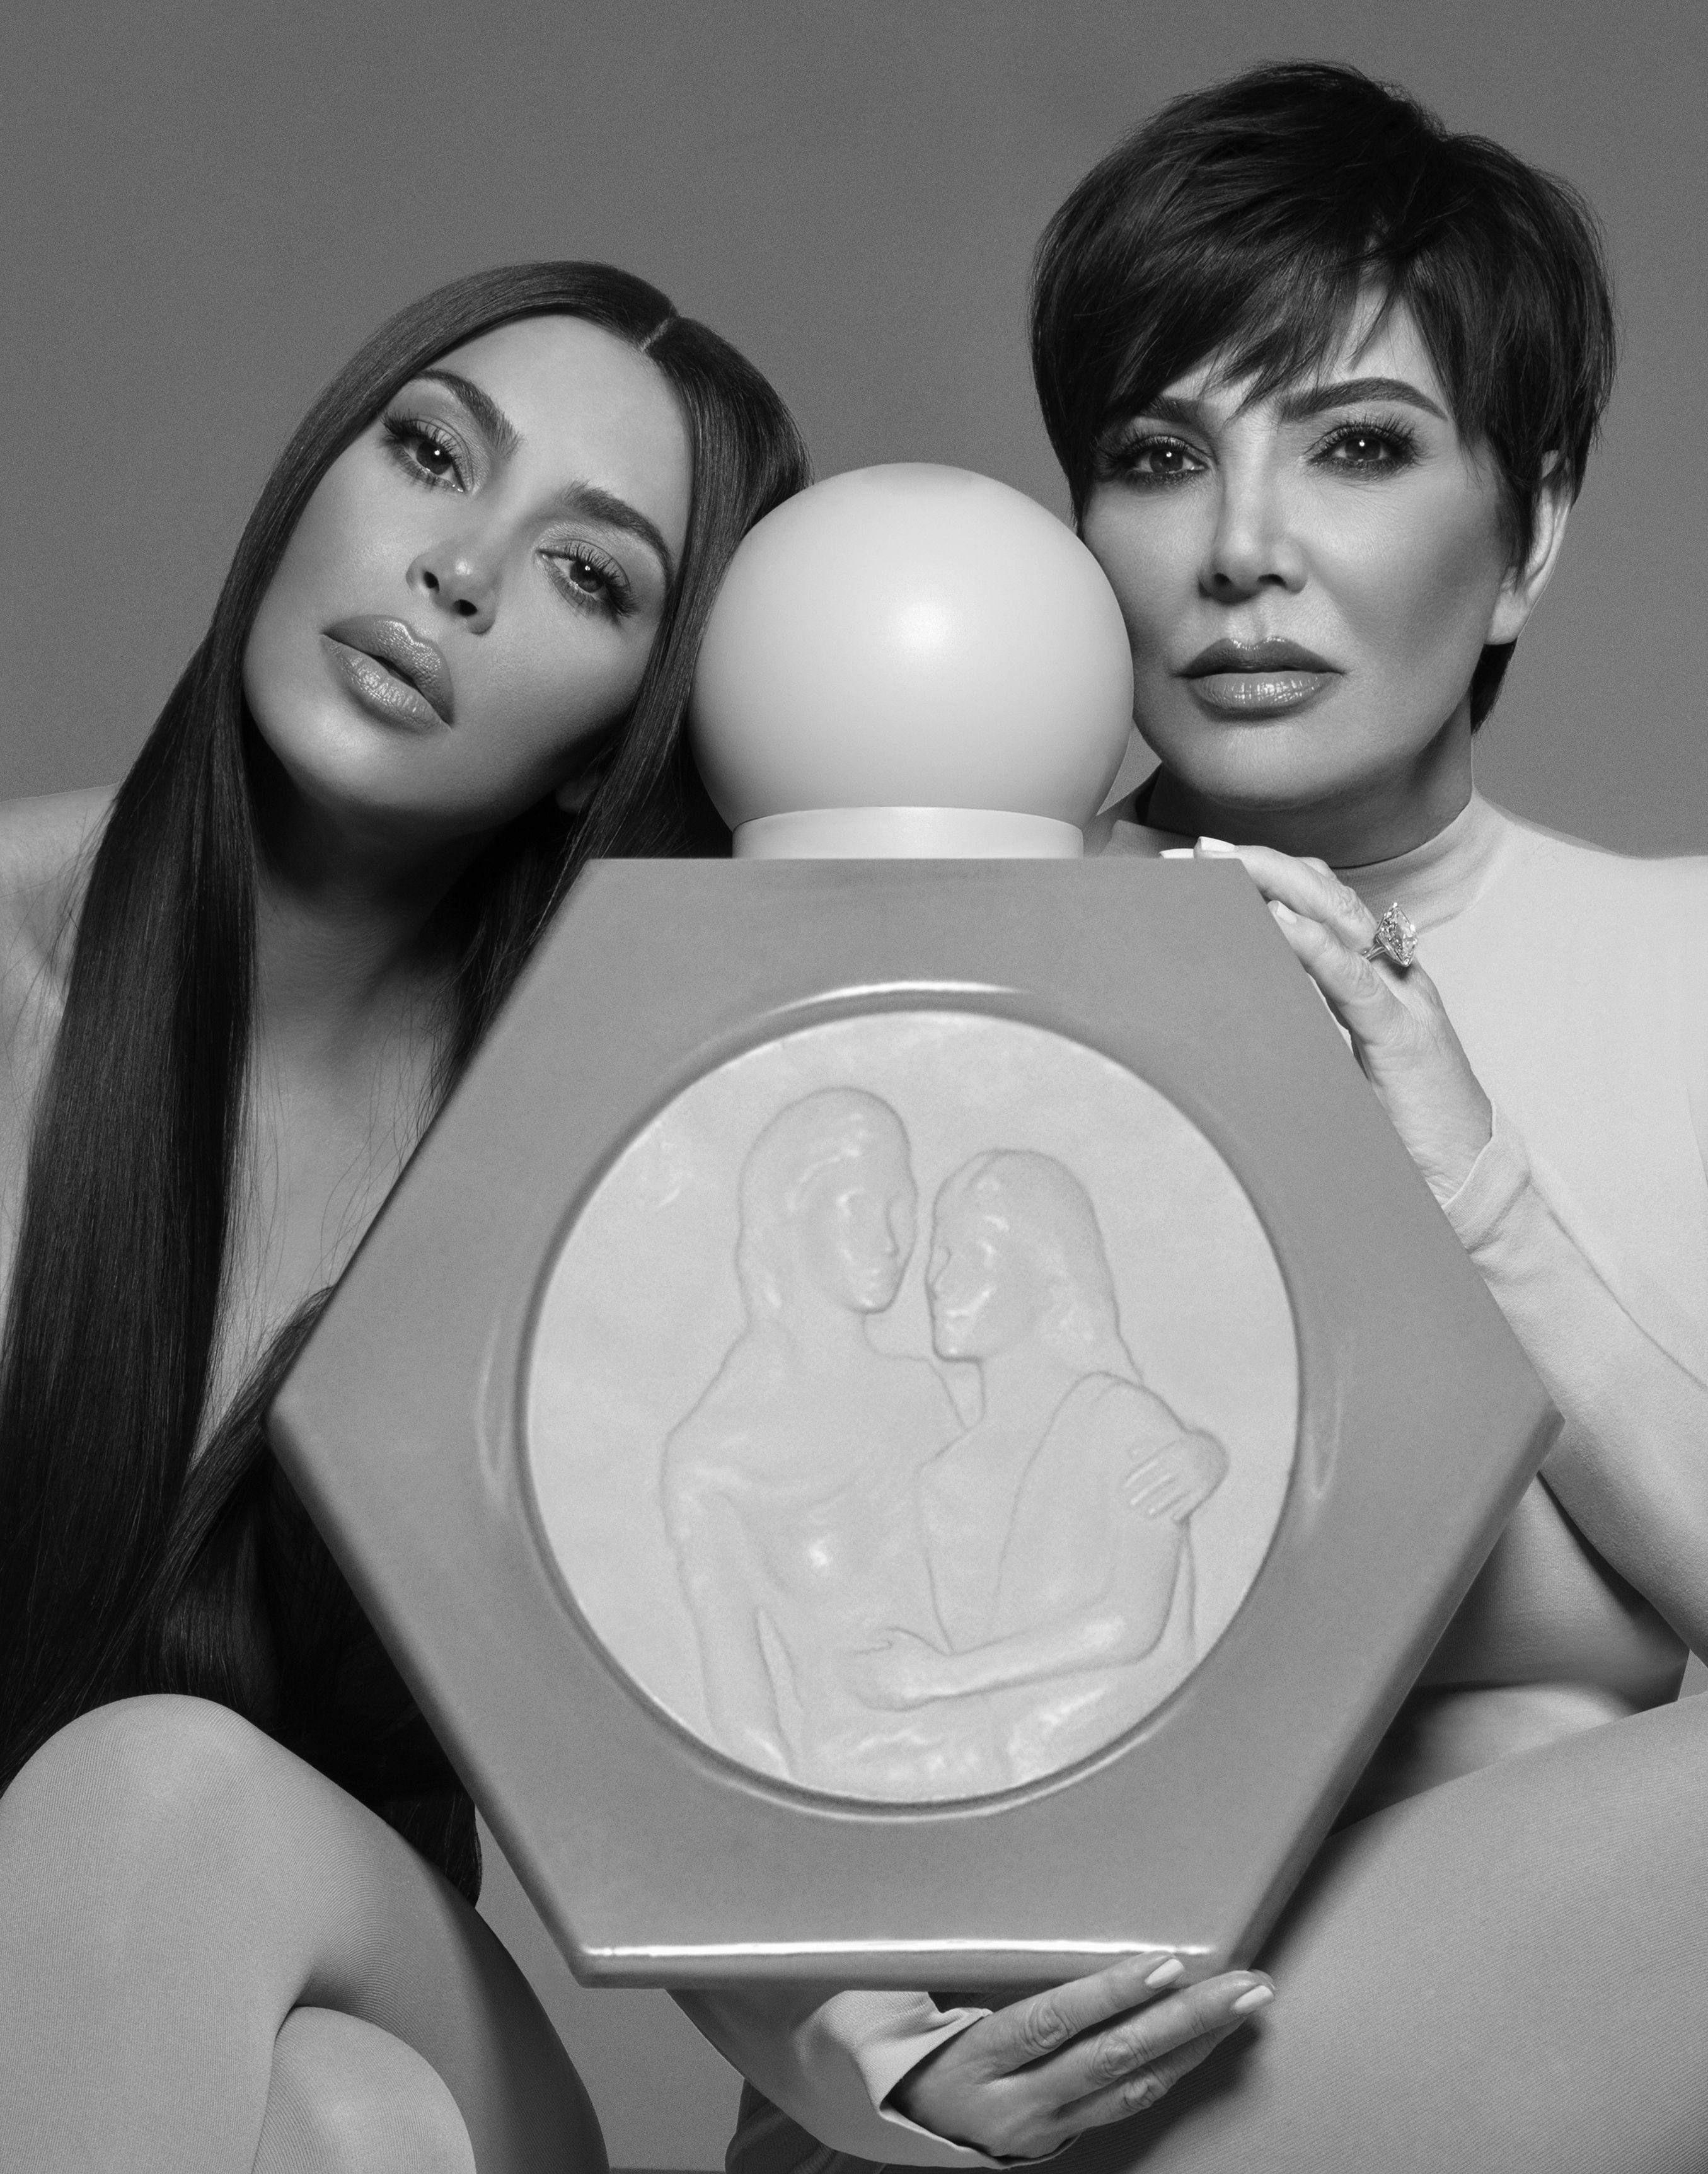 Kim Kardashian West & Kris Jenner Celebrate Mother's Day With A New KKW Fragrance